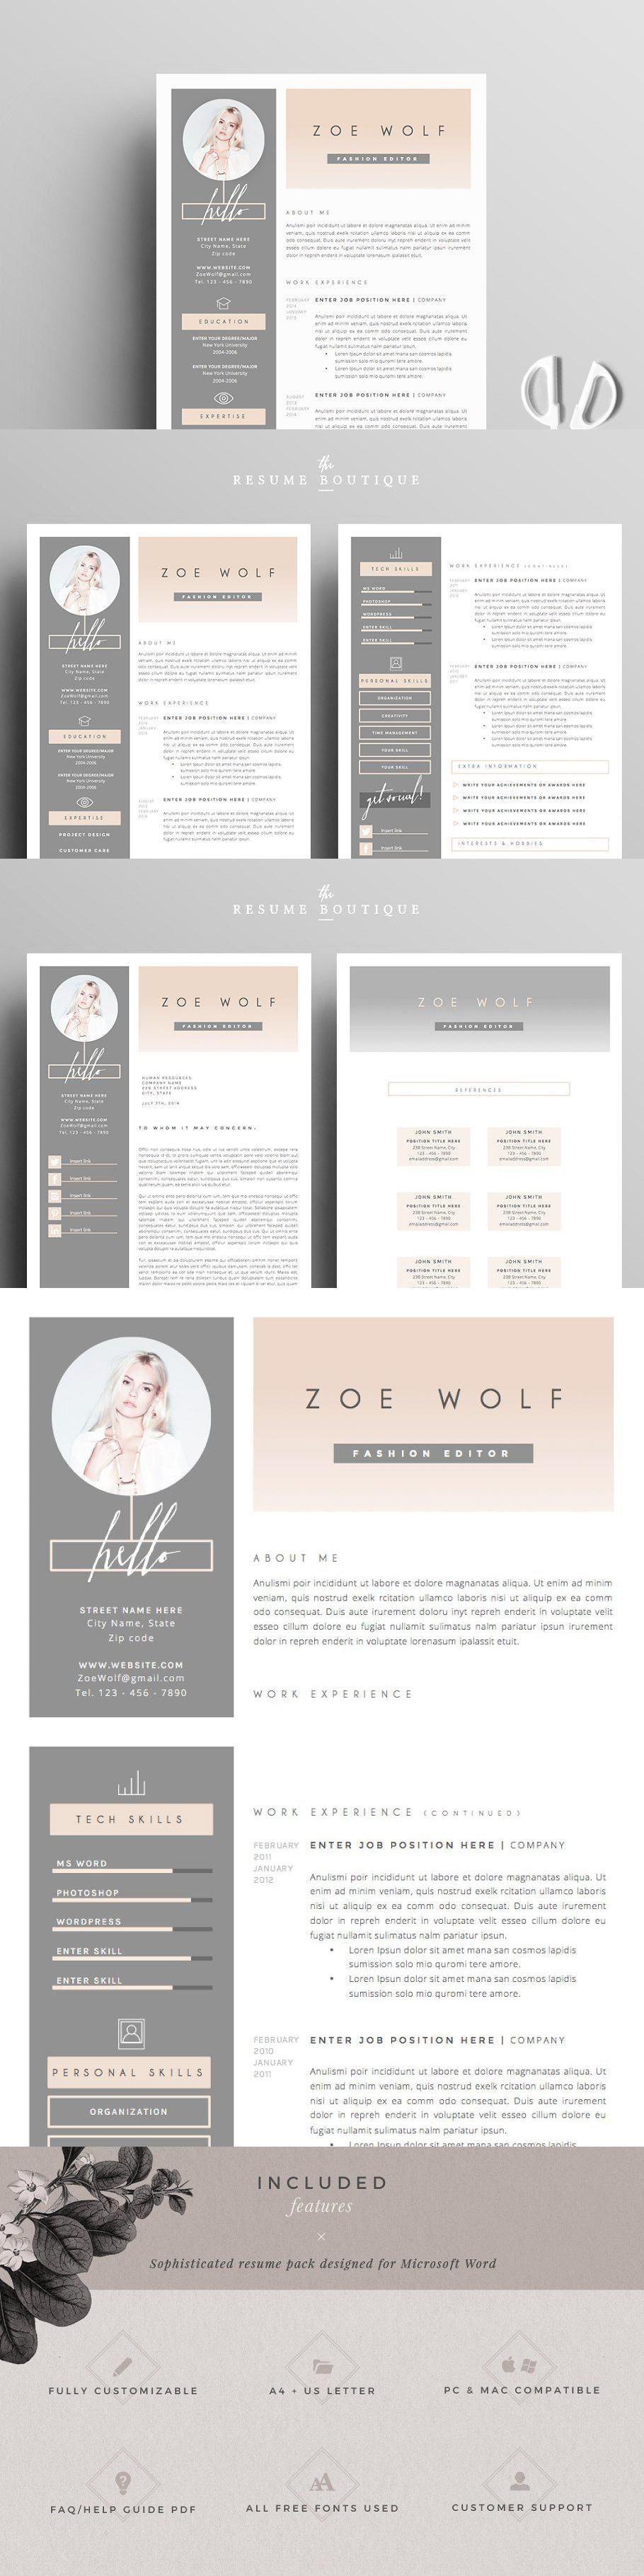 Click For More Resume Templates Behance Cvtemplate Stationerydesign Cvtemplate Docx Graph Print Design Template Resume Design Template Cv Design Template